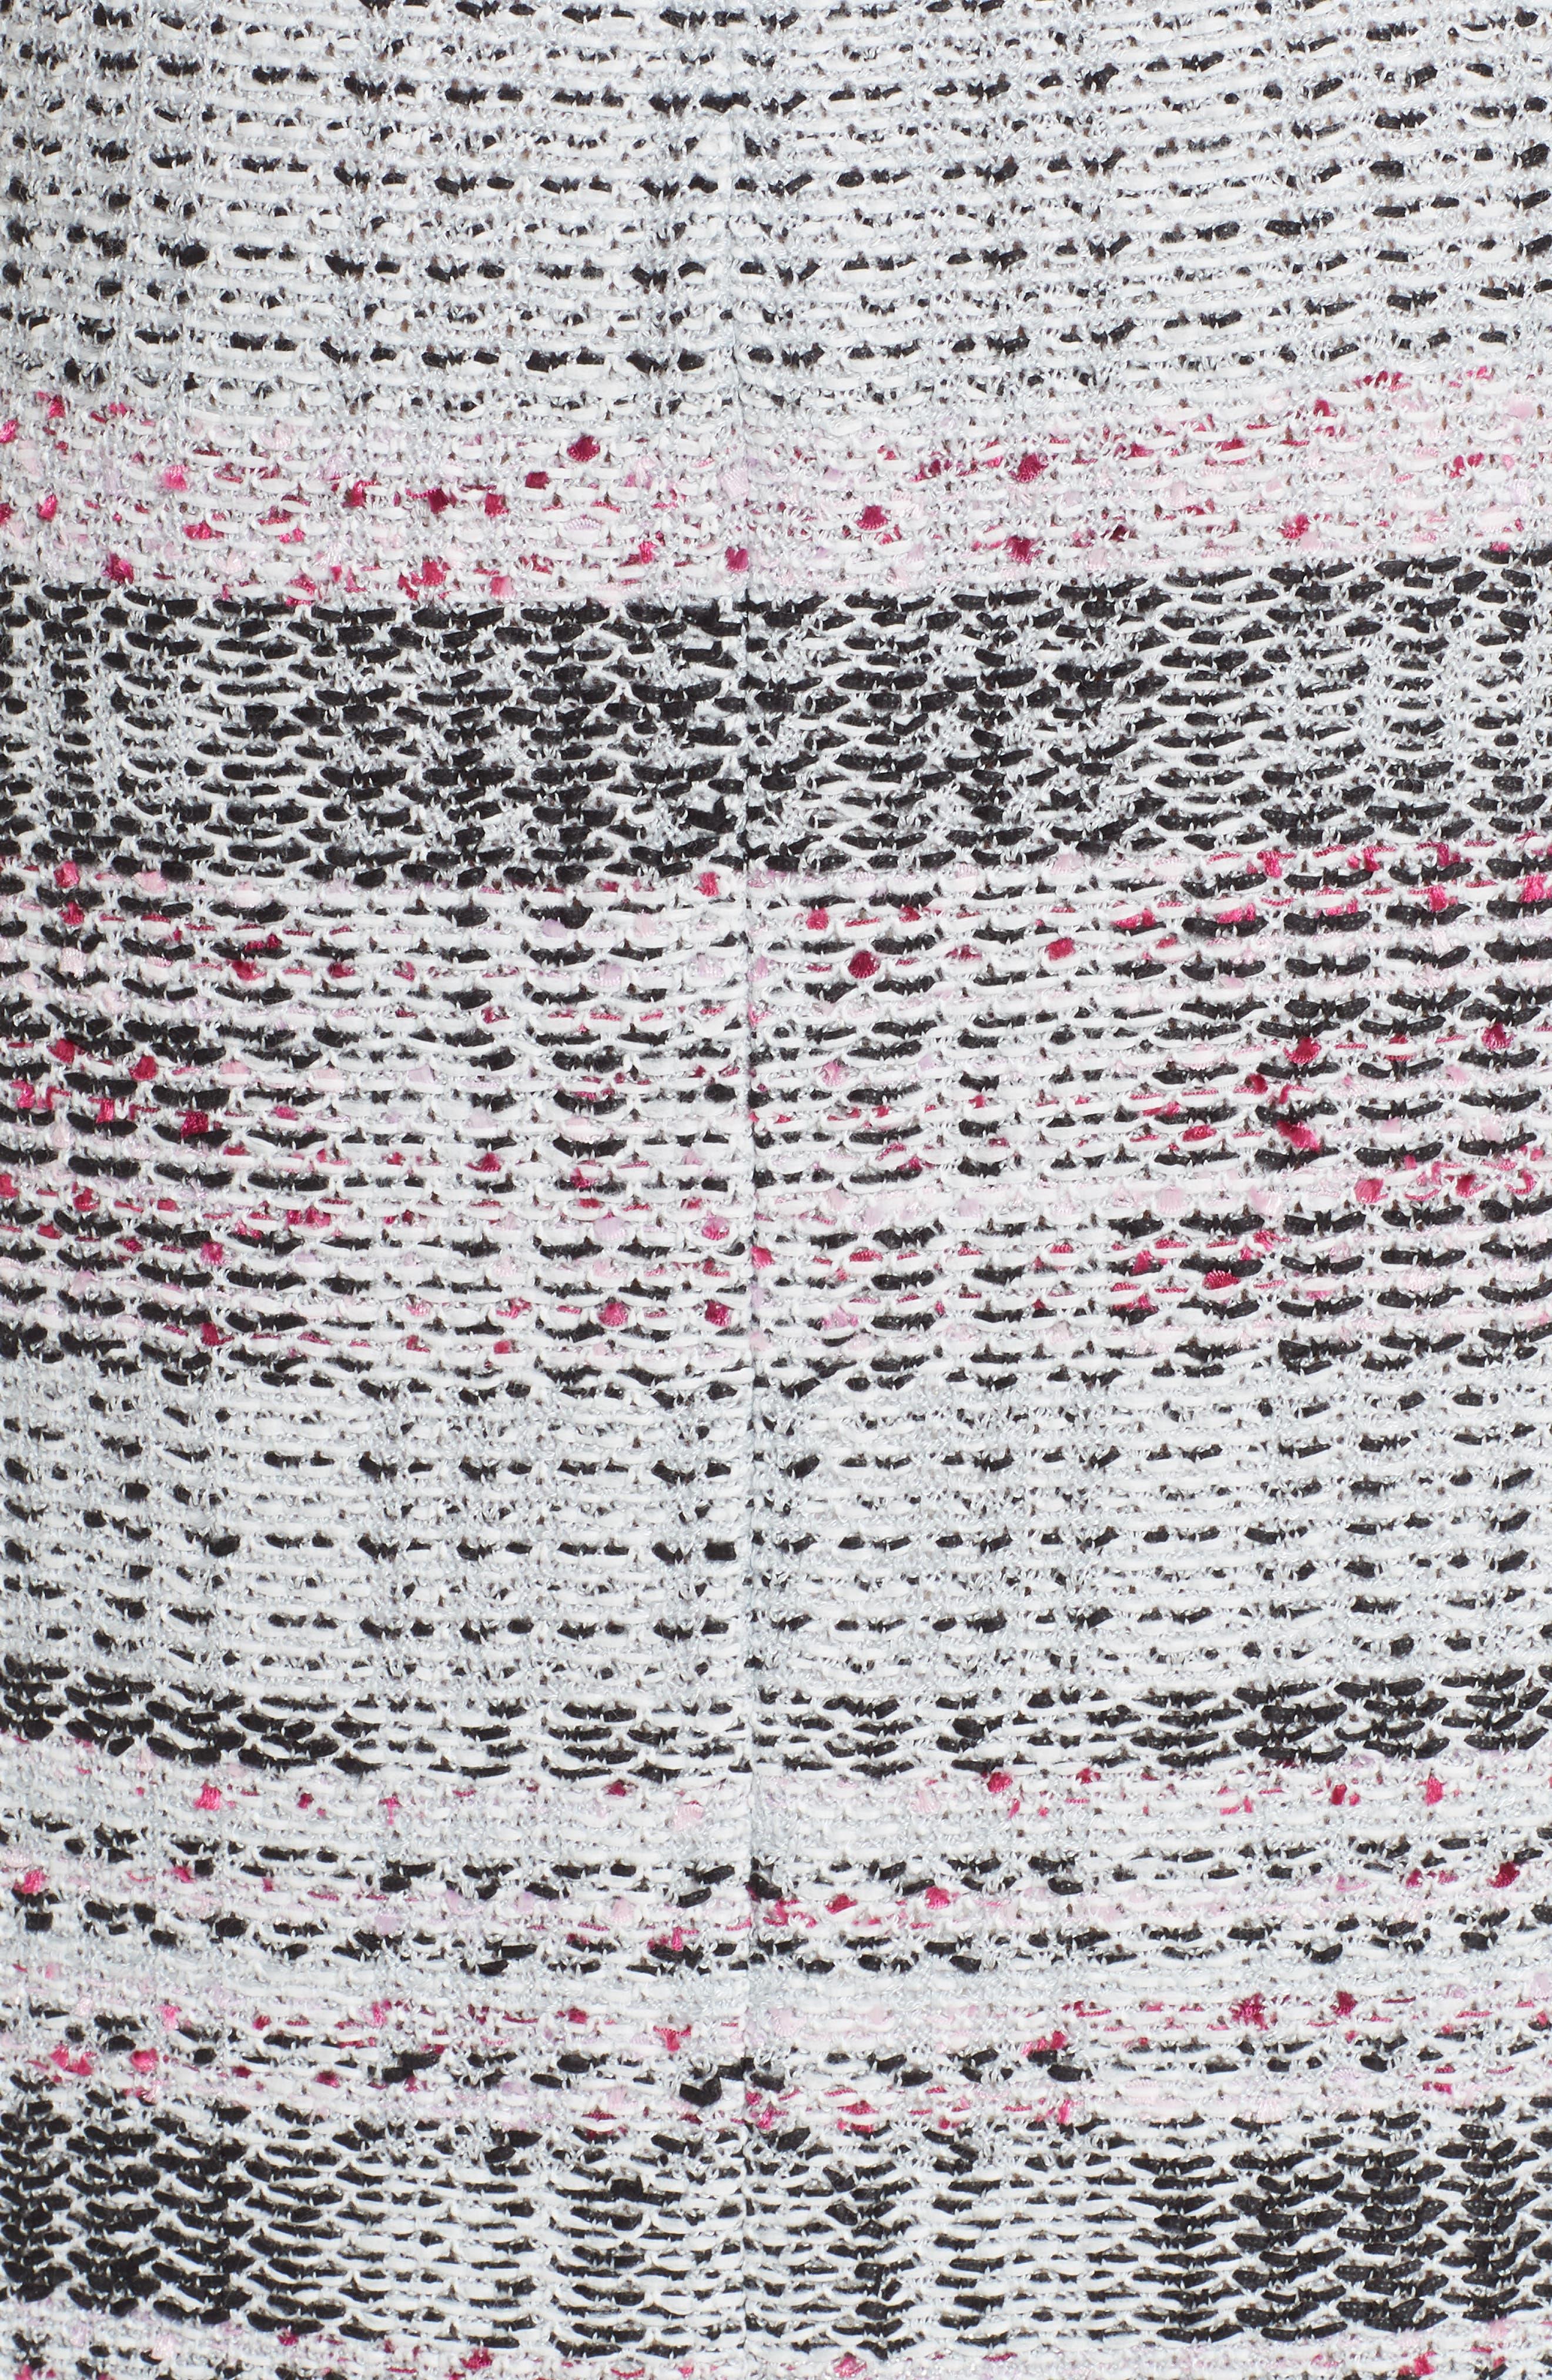 Bianca Plaid Knit Sheath Dress,                             Alternate thumbnail 6, color,                             GREY MULTI